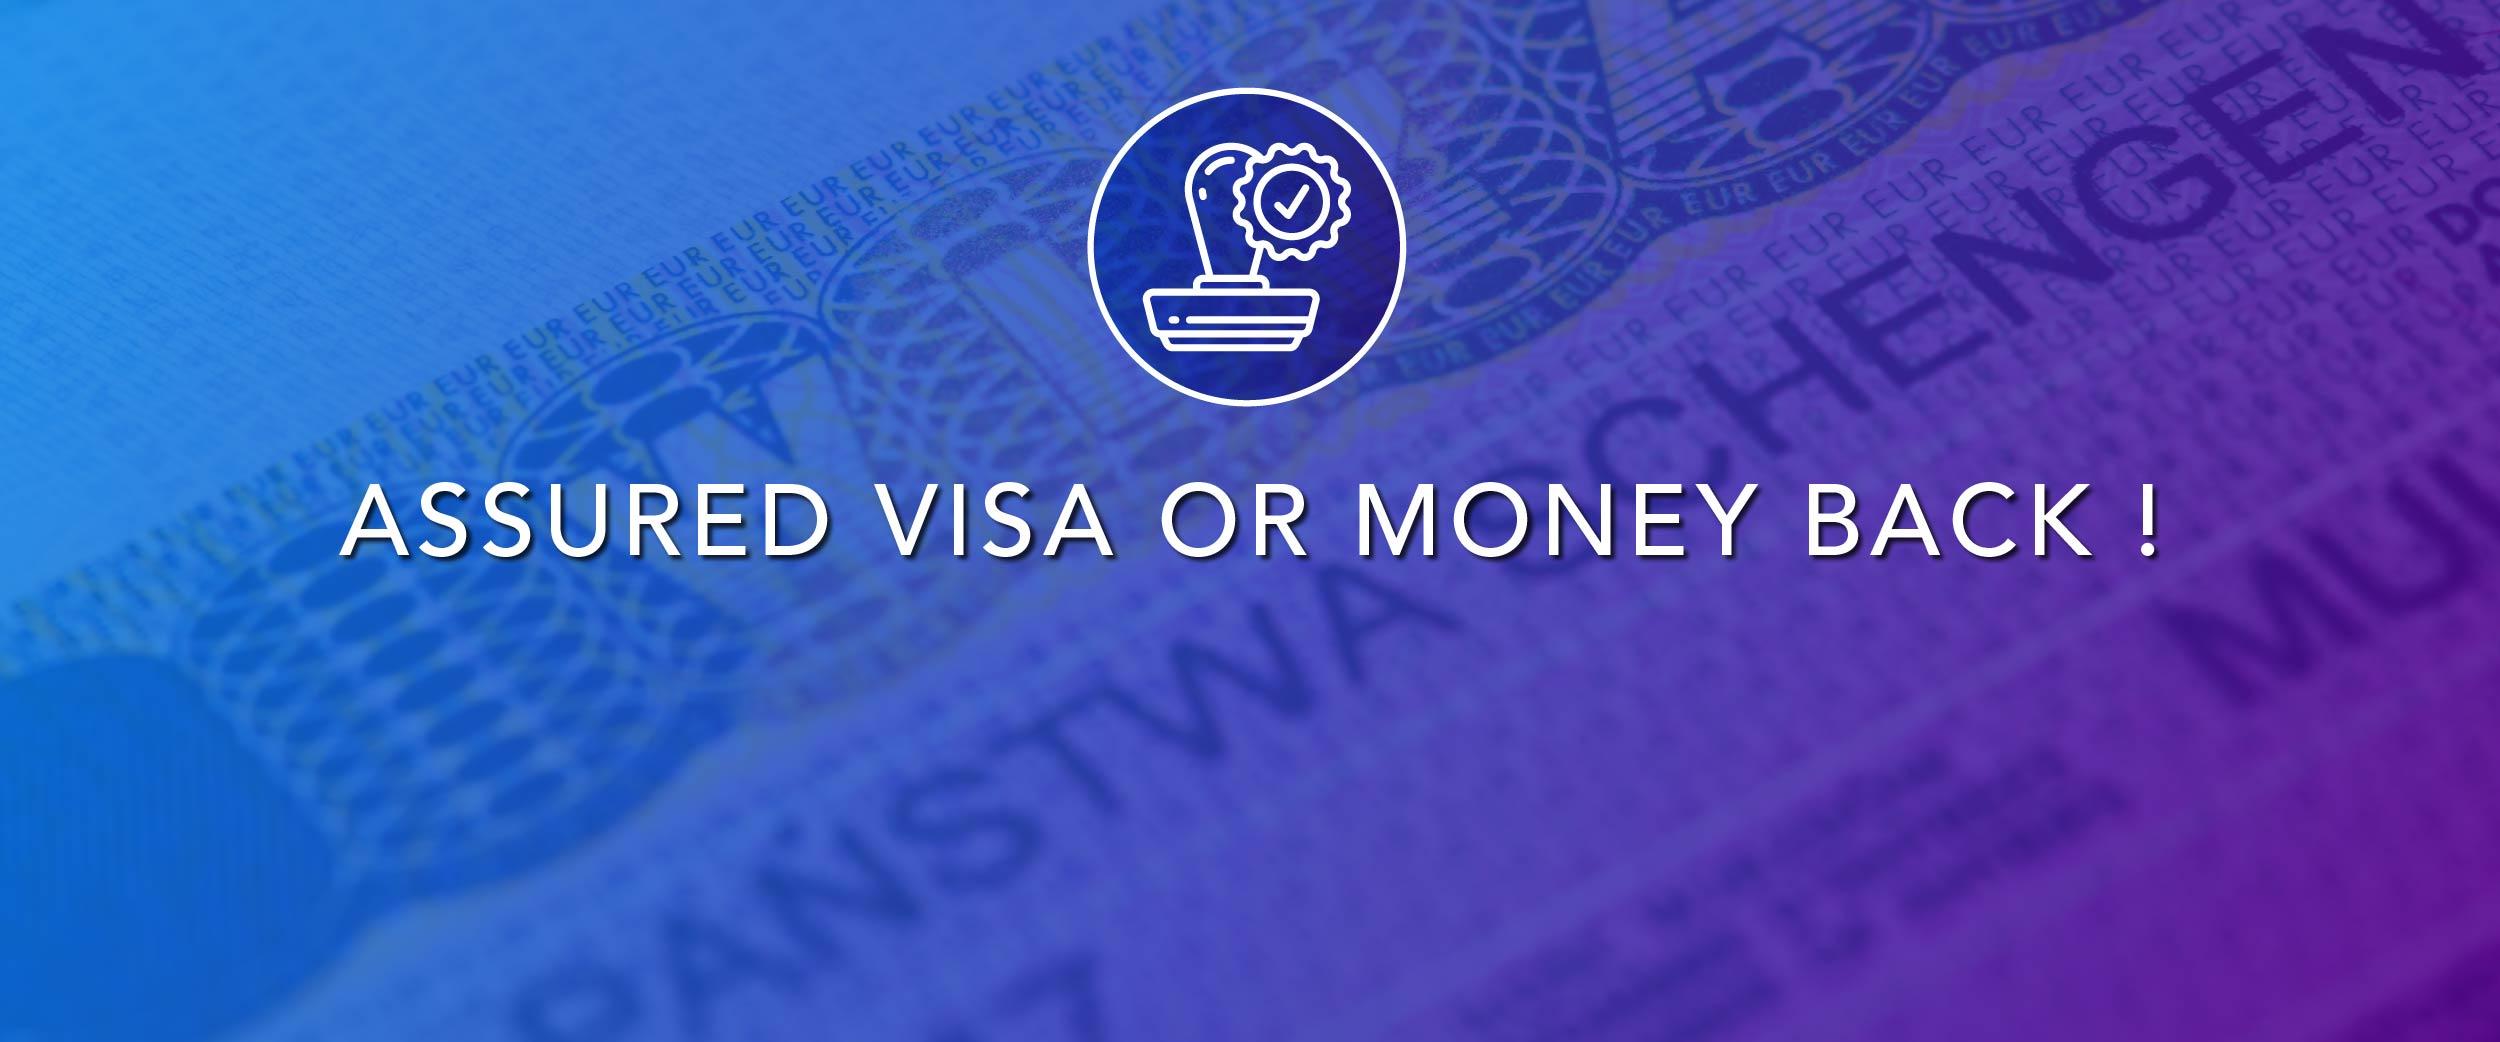 assured-visa-01